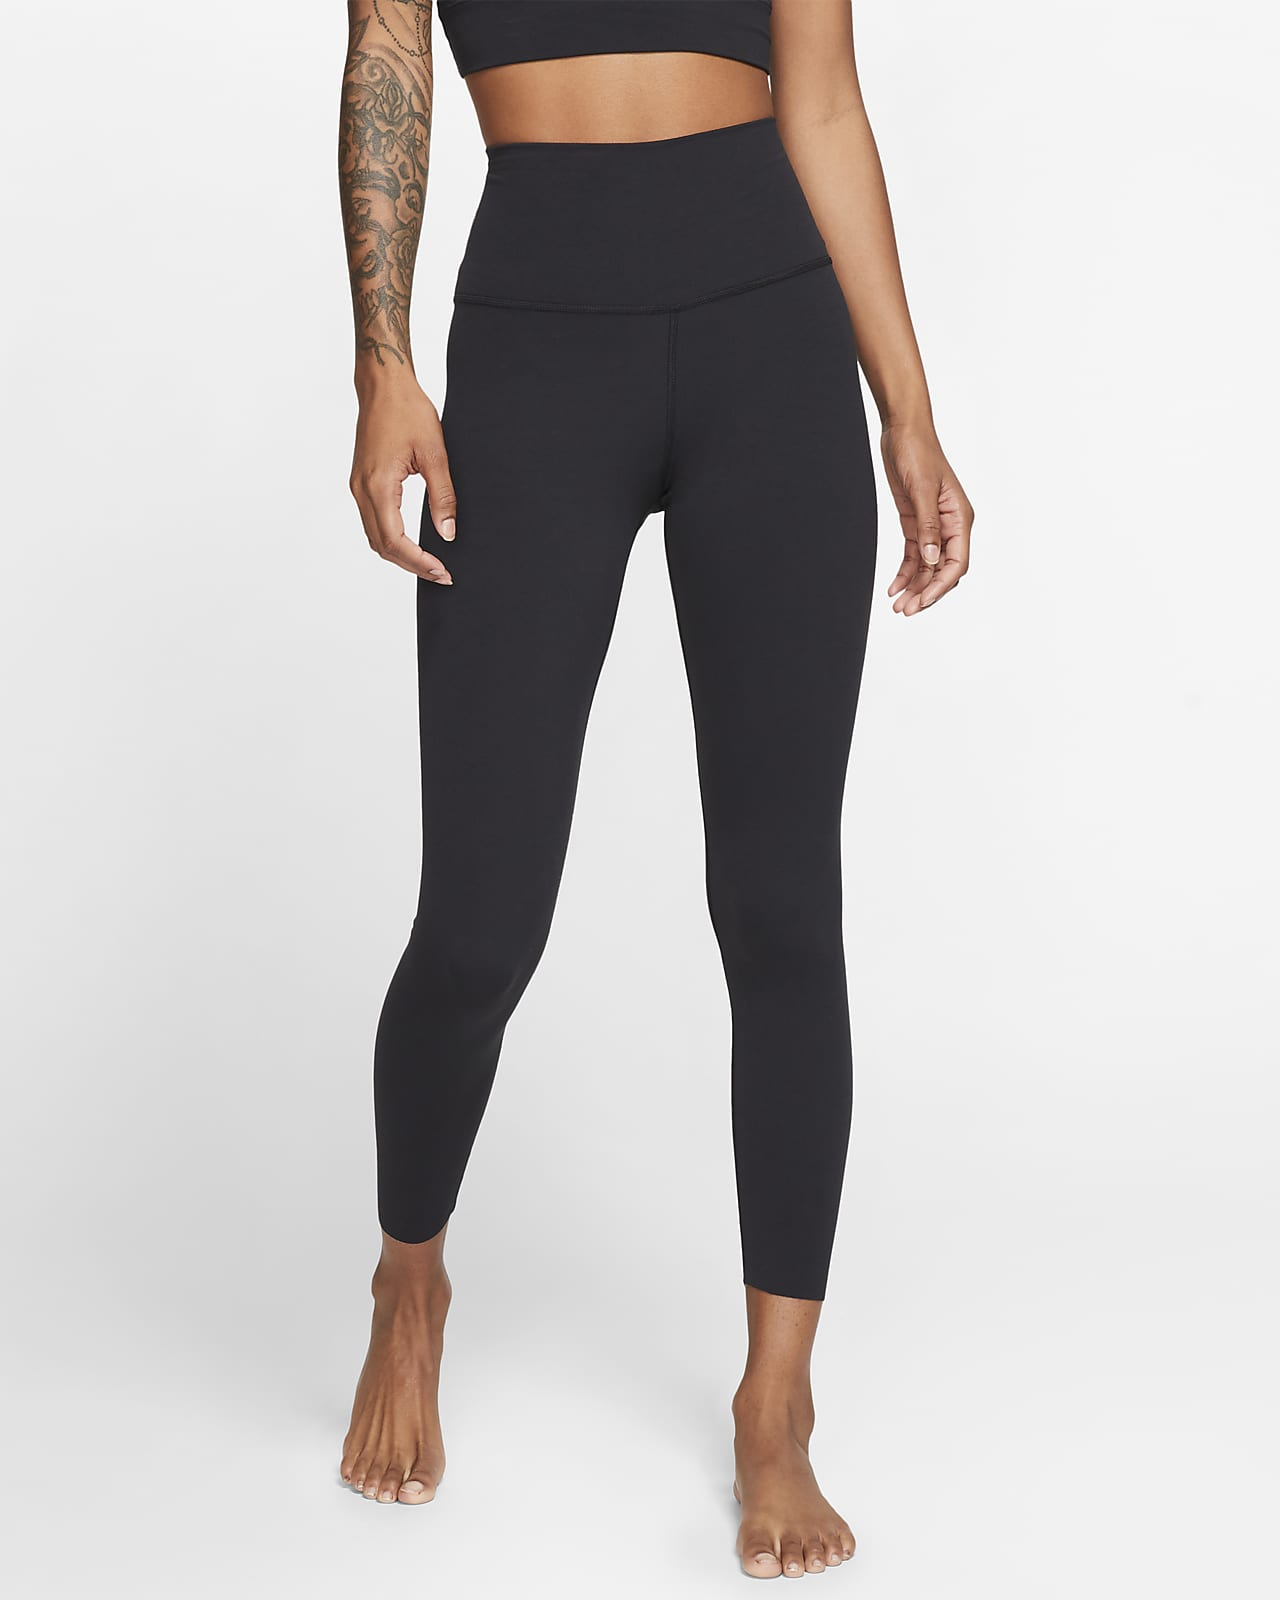 Leggings a 7/8 em Infinalon Nike Yoga Luxe para mulher